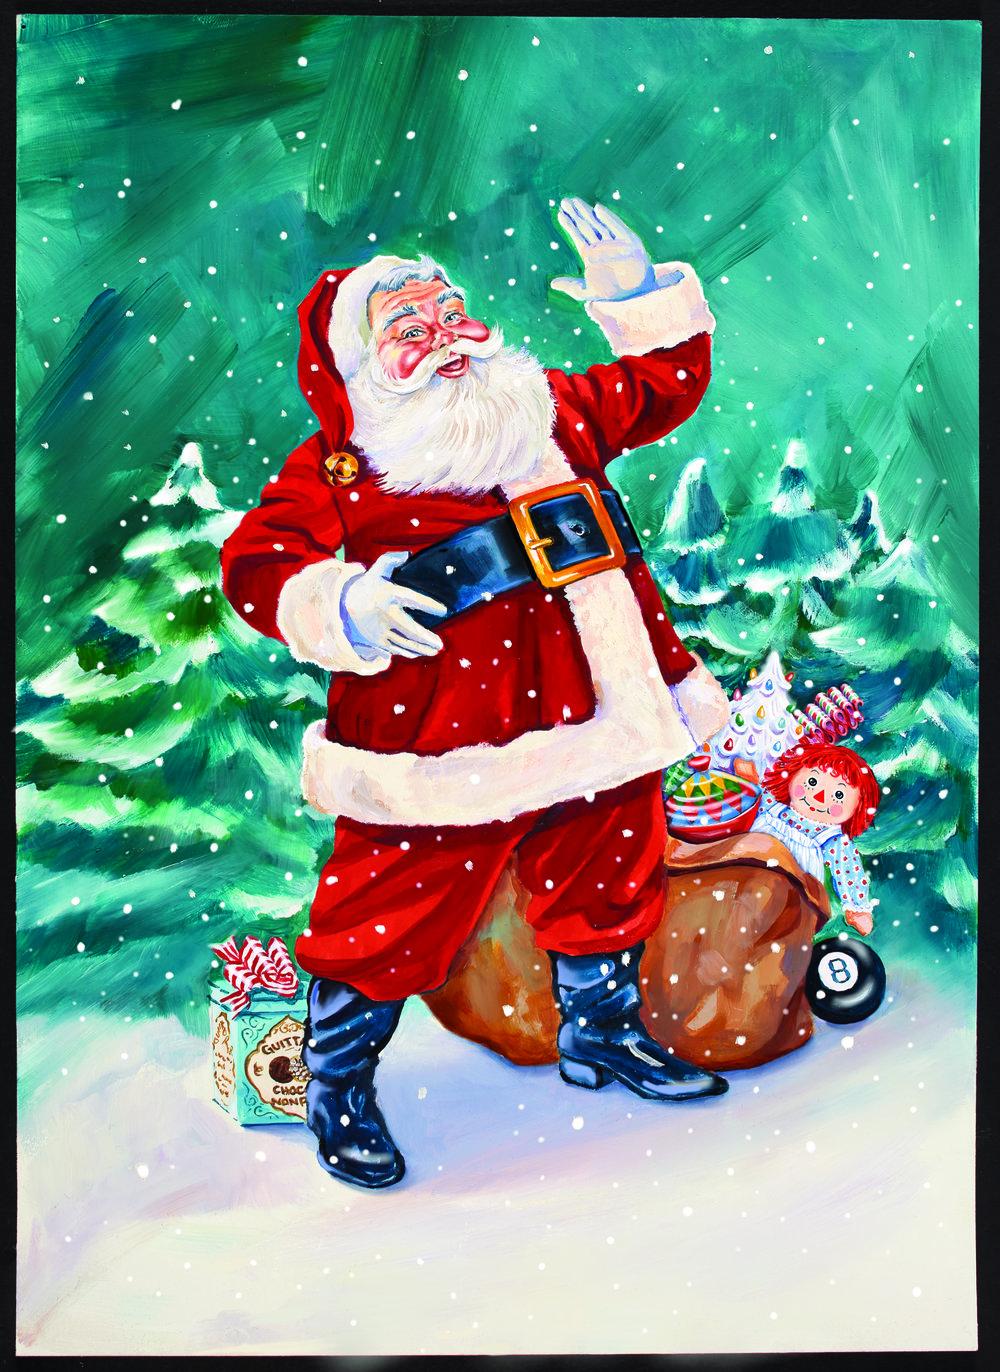 Christmas_2017_Santa_ill.jpg